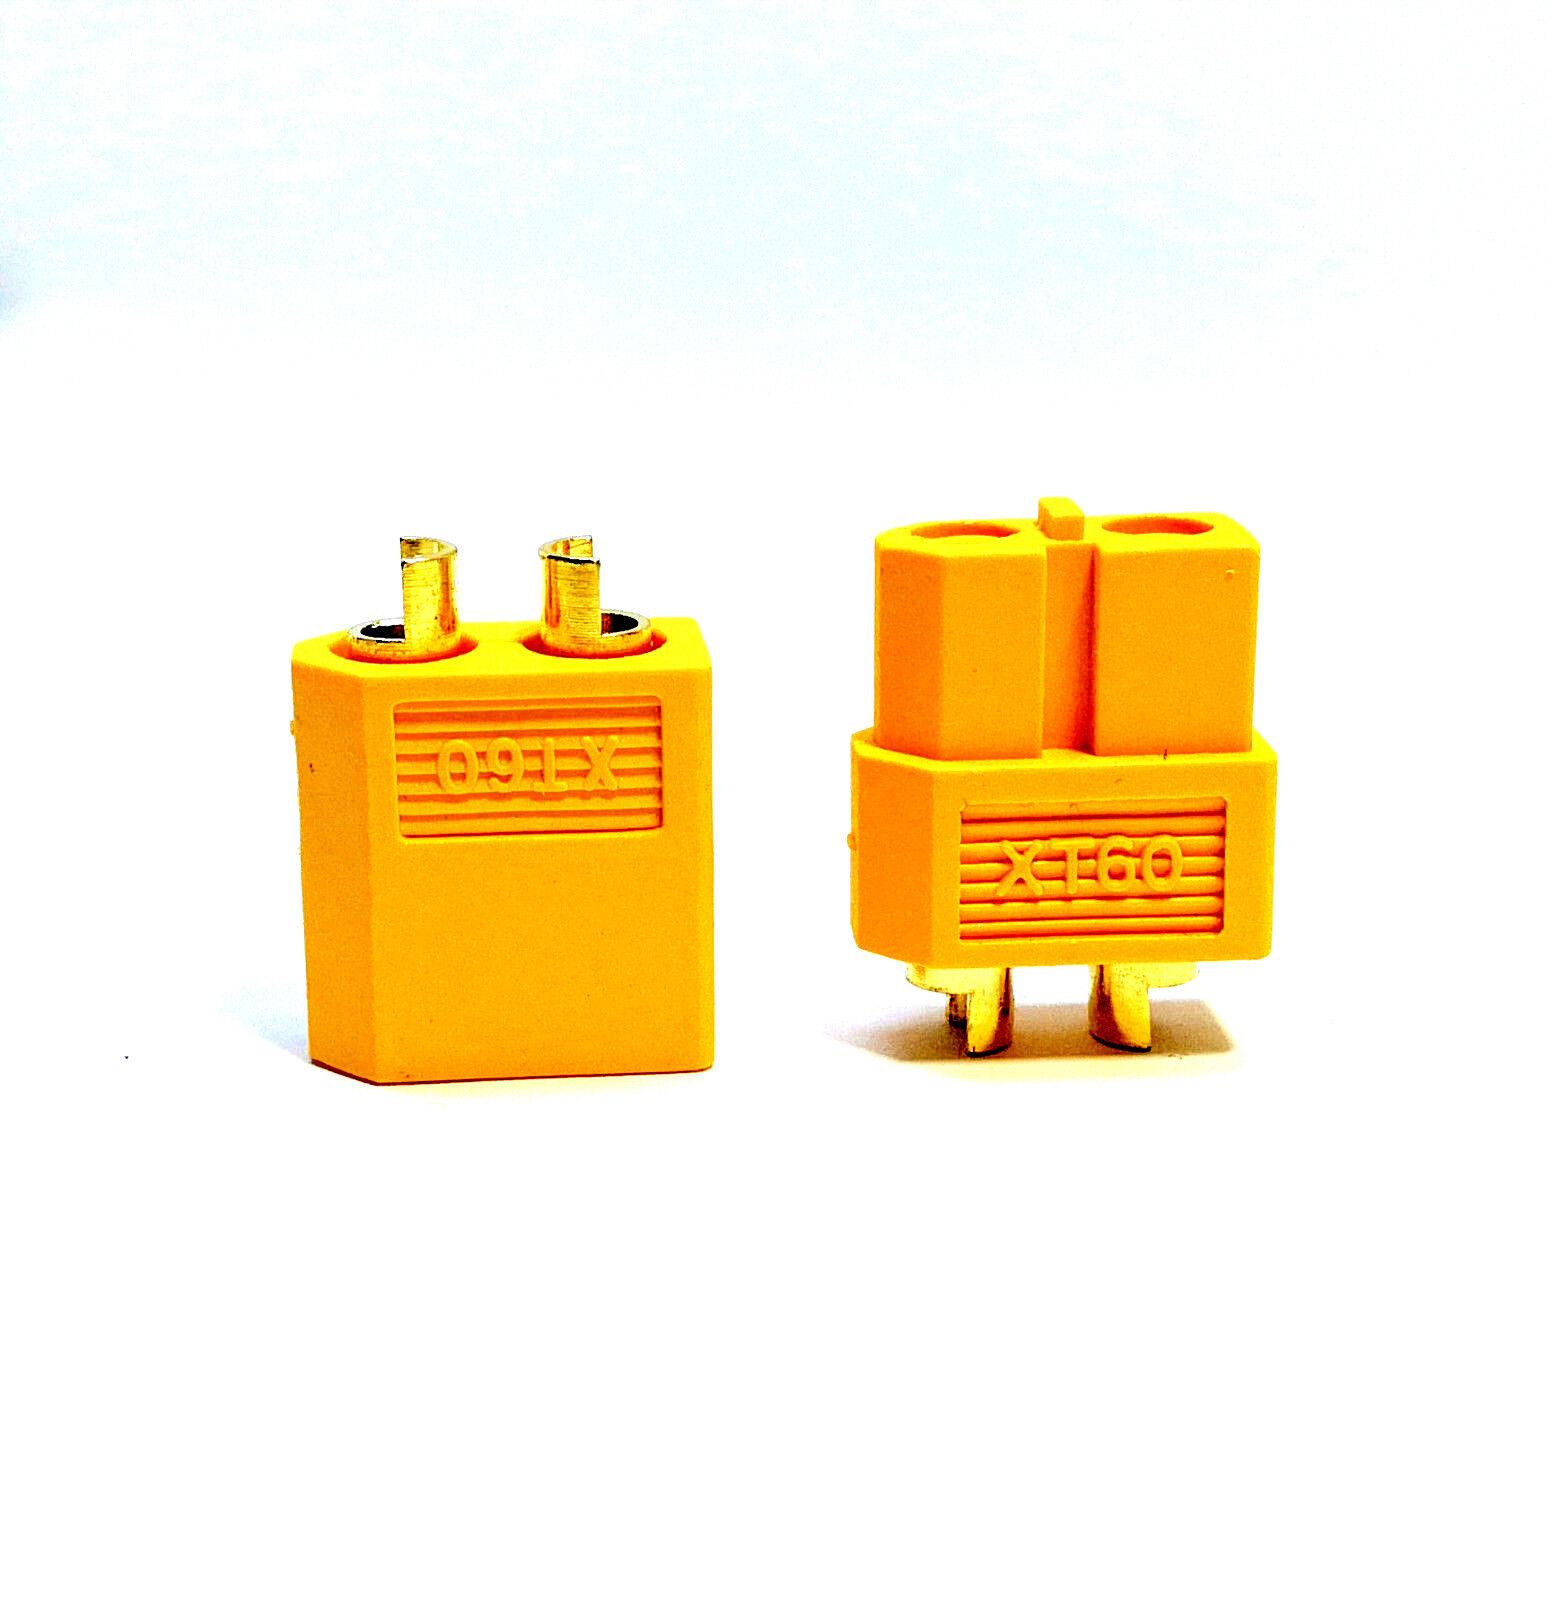 XT30 XT60 XT60U XT60L XT90 XT90S EC2 EC3 EC5 EC8 T-Dean MPX HXT TRX Stecker RC